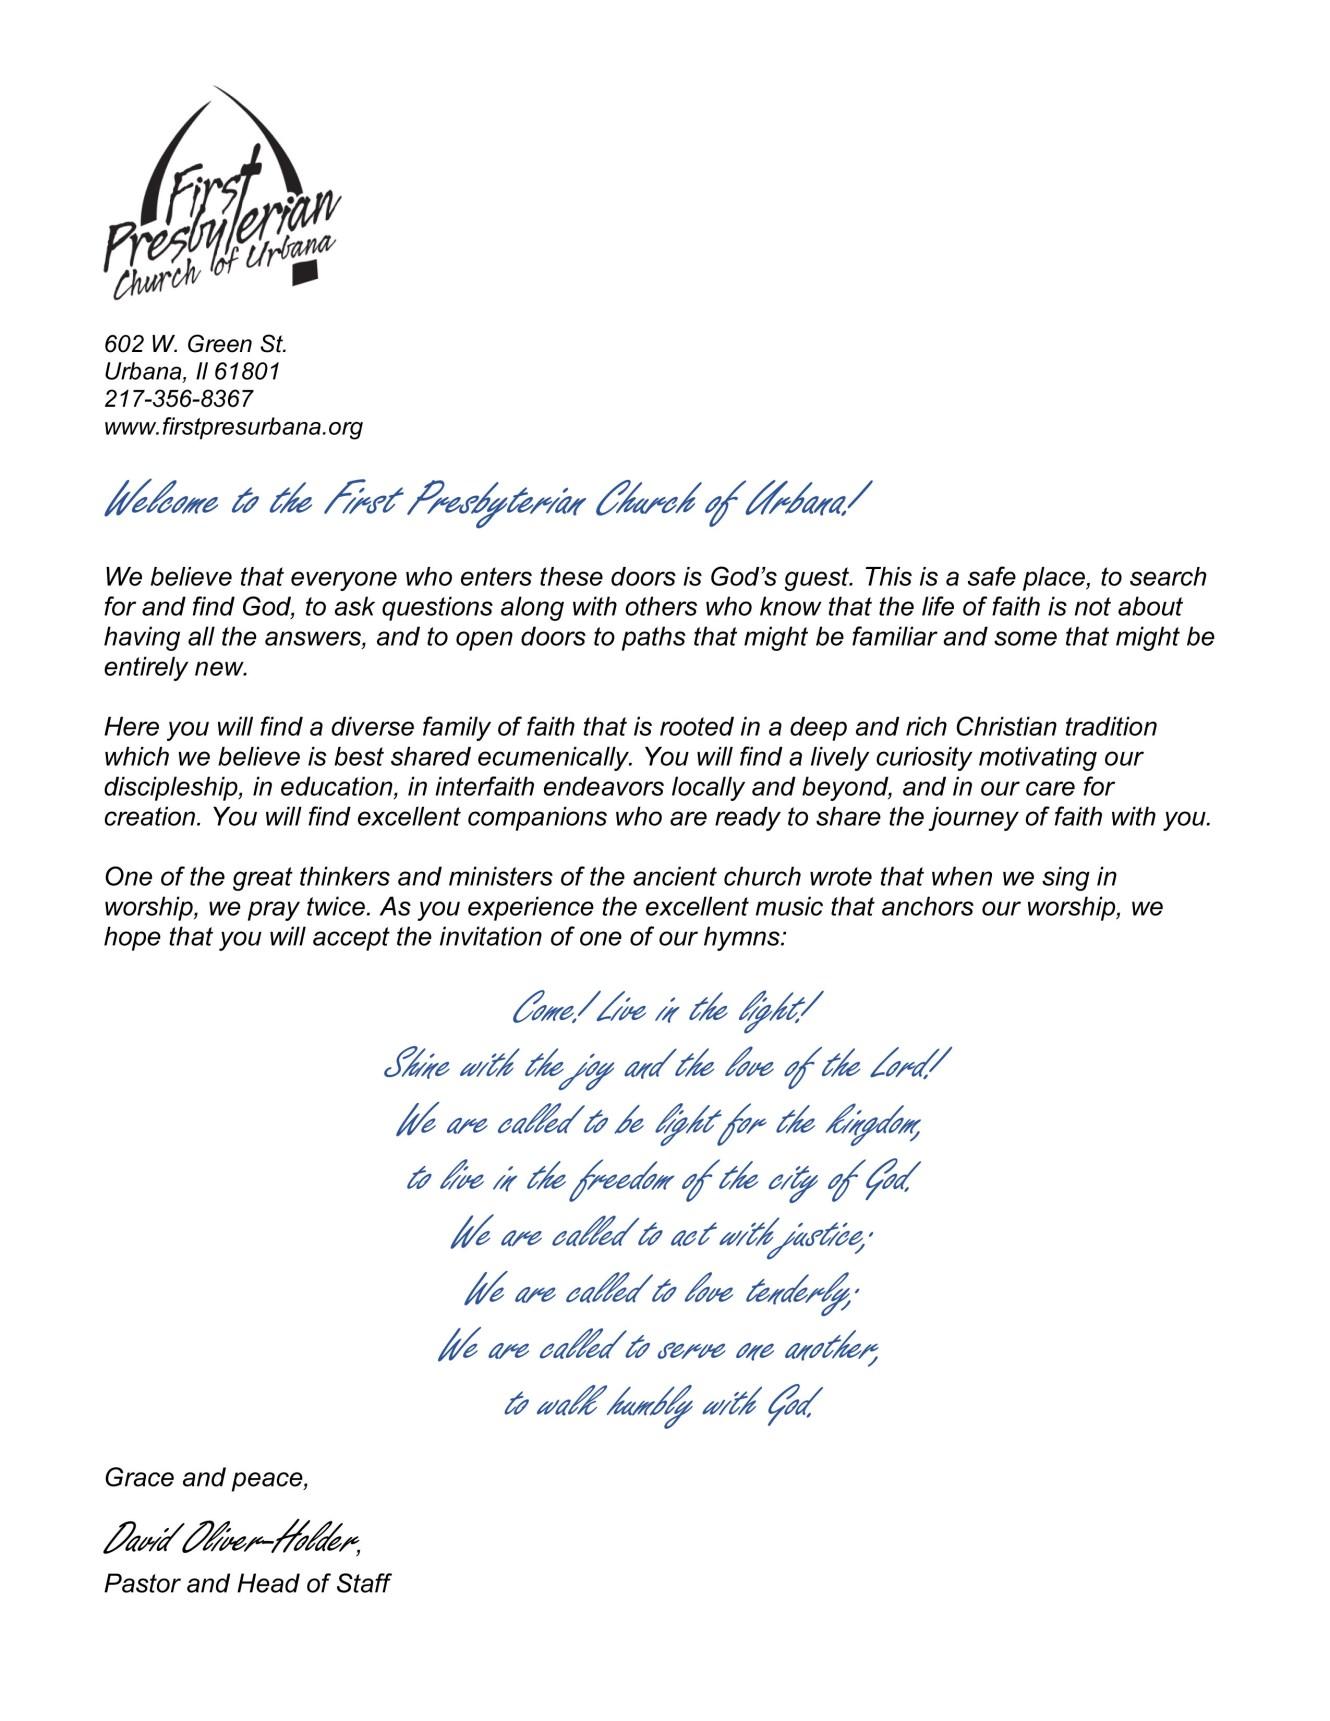 Welcome letter first presbyterian urbana thecheapjerseys Gallery